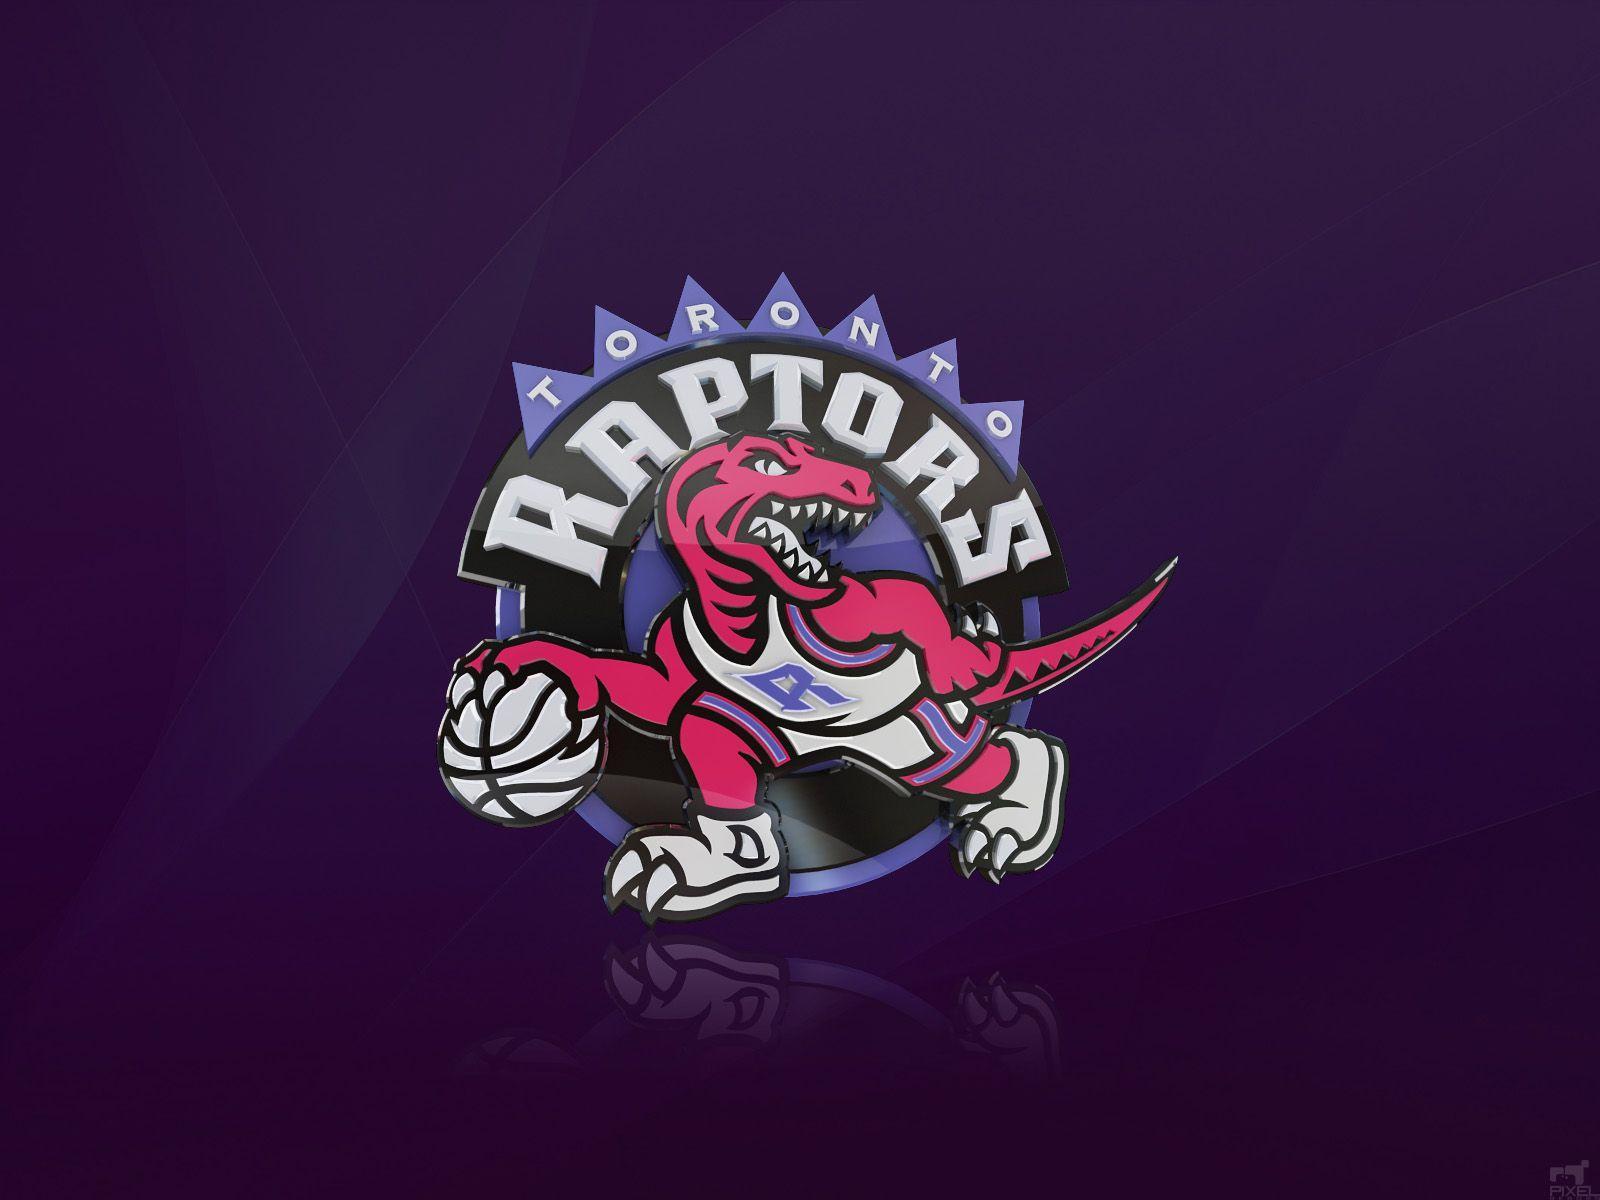 Toronto Raptors Nba Champions Wallpapers: Toronto Raptors 2018 Wallpapers